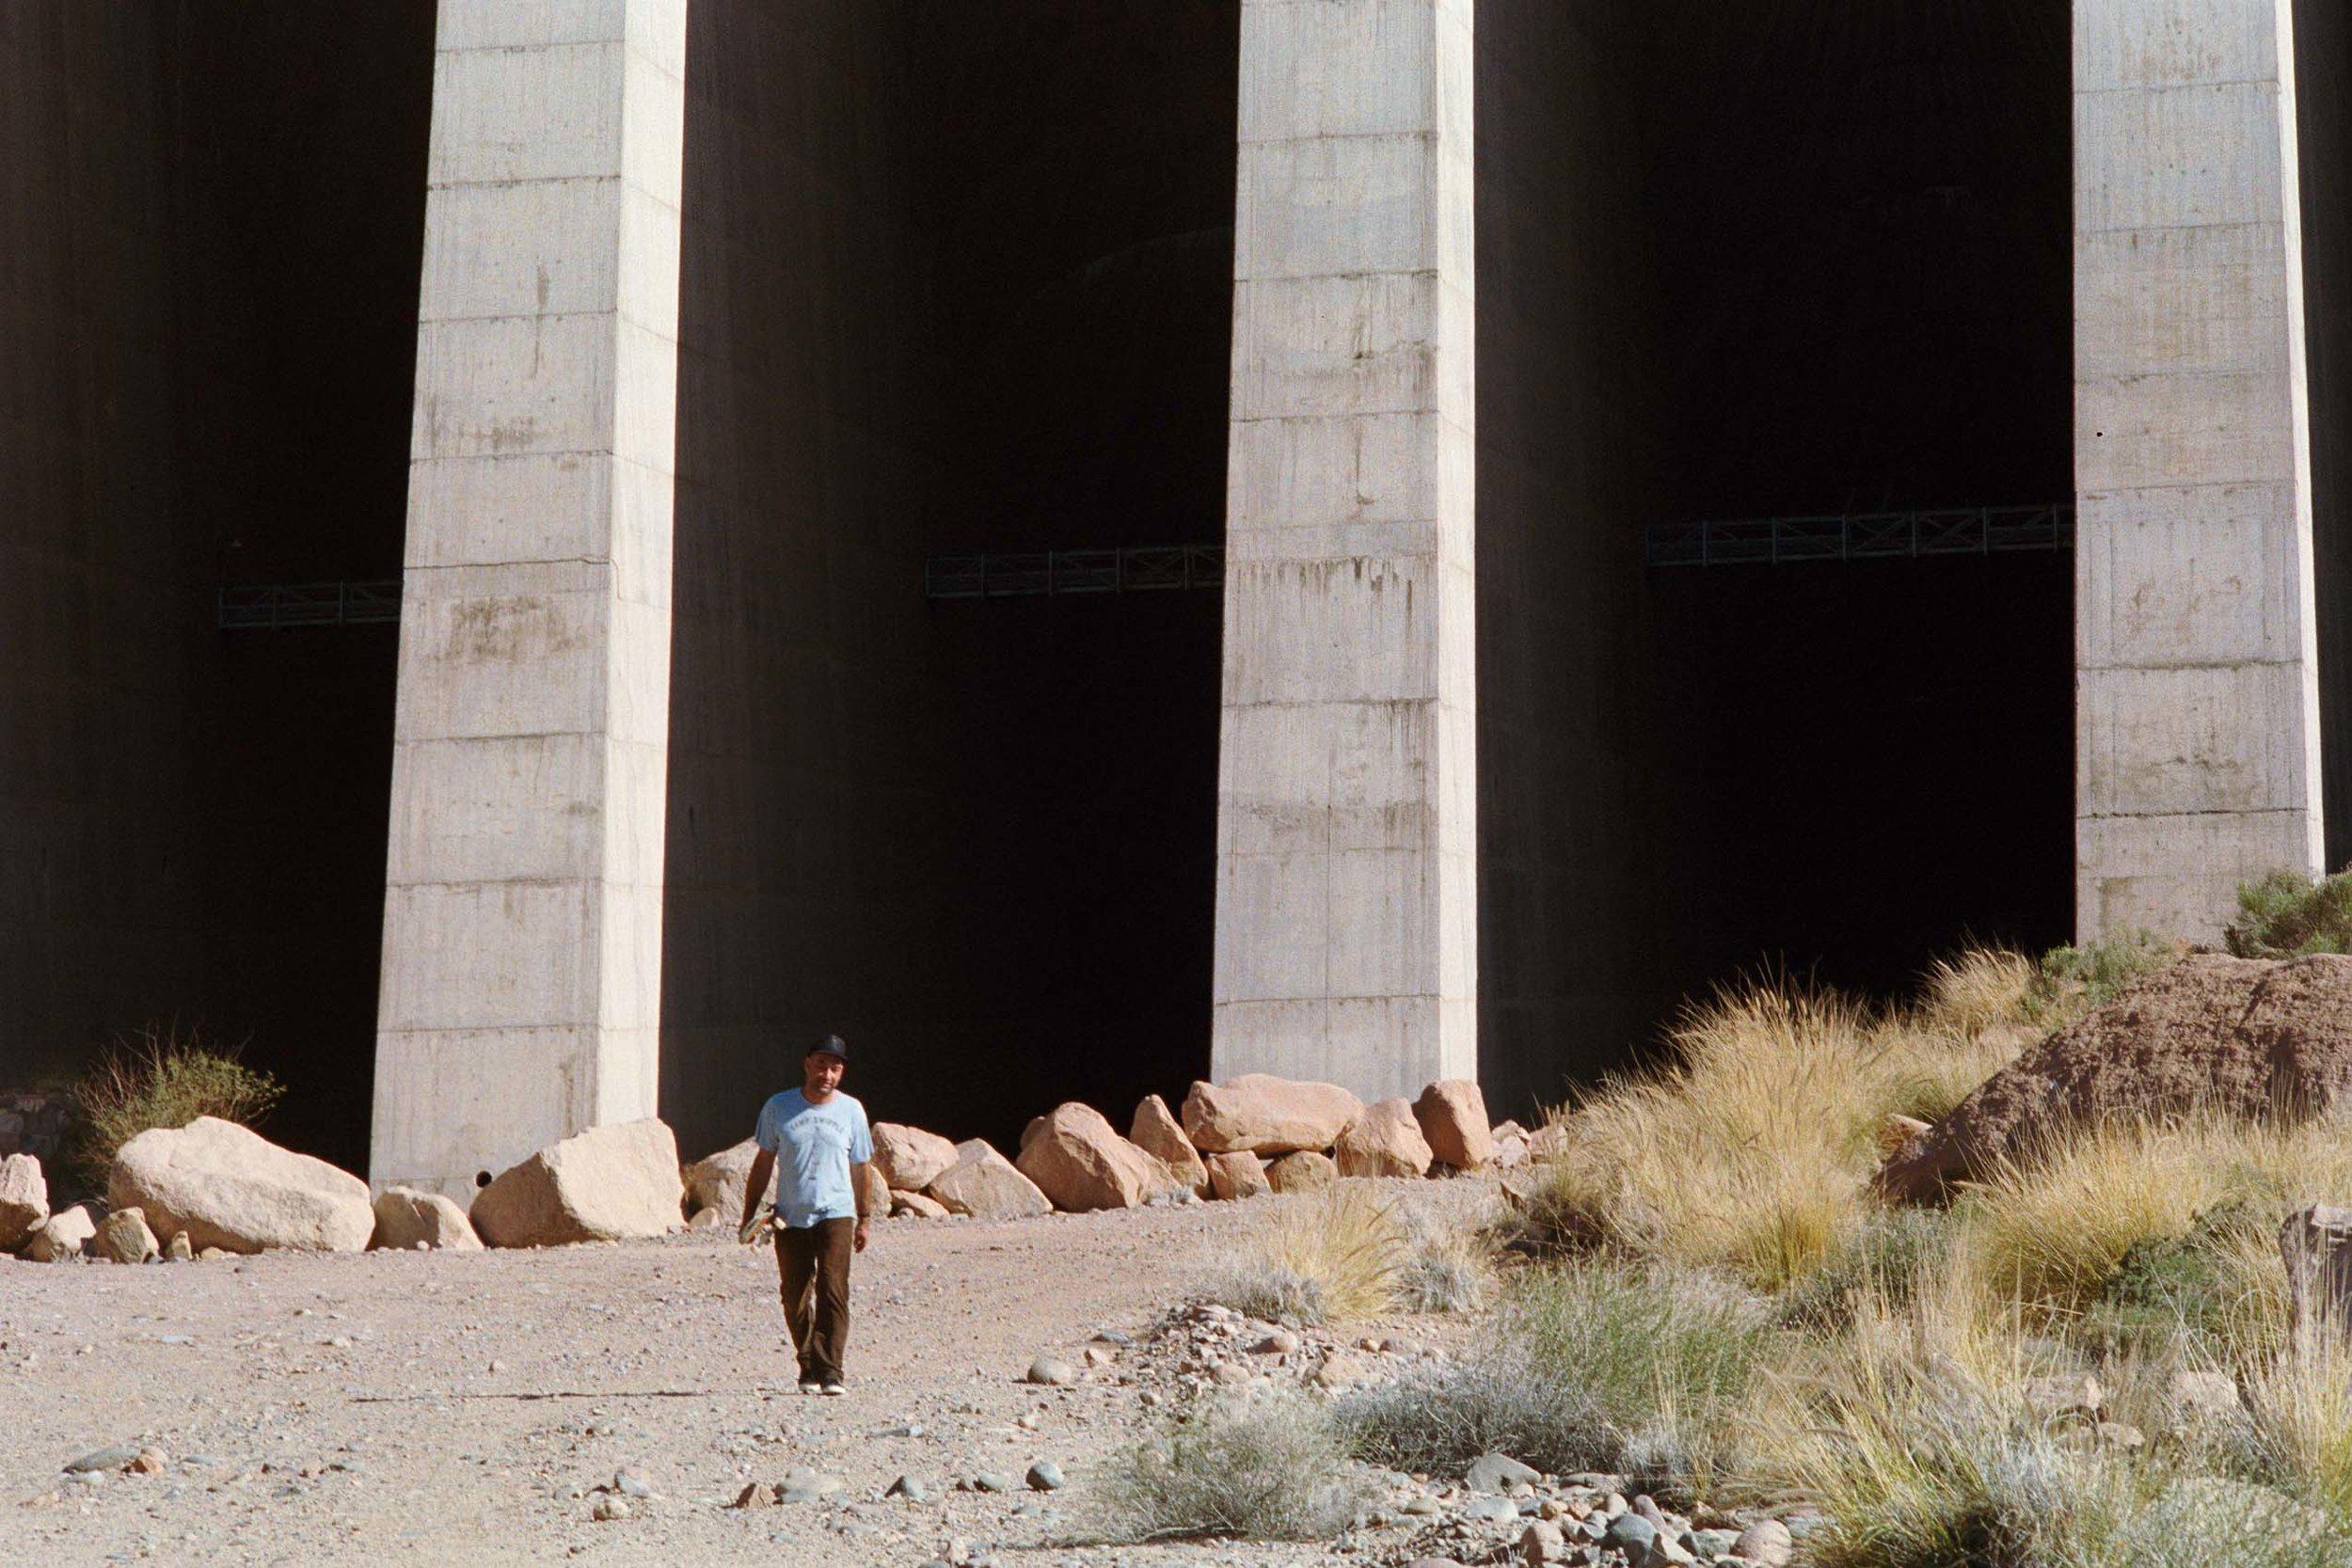 Jocko Weyland, Rio Verde AZ